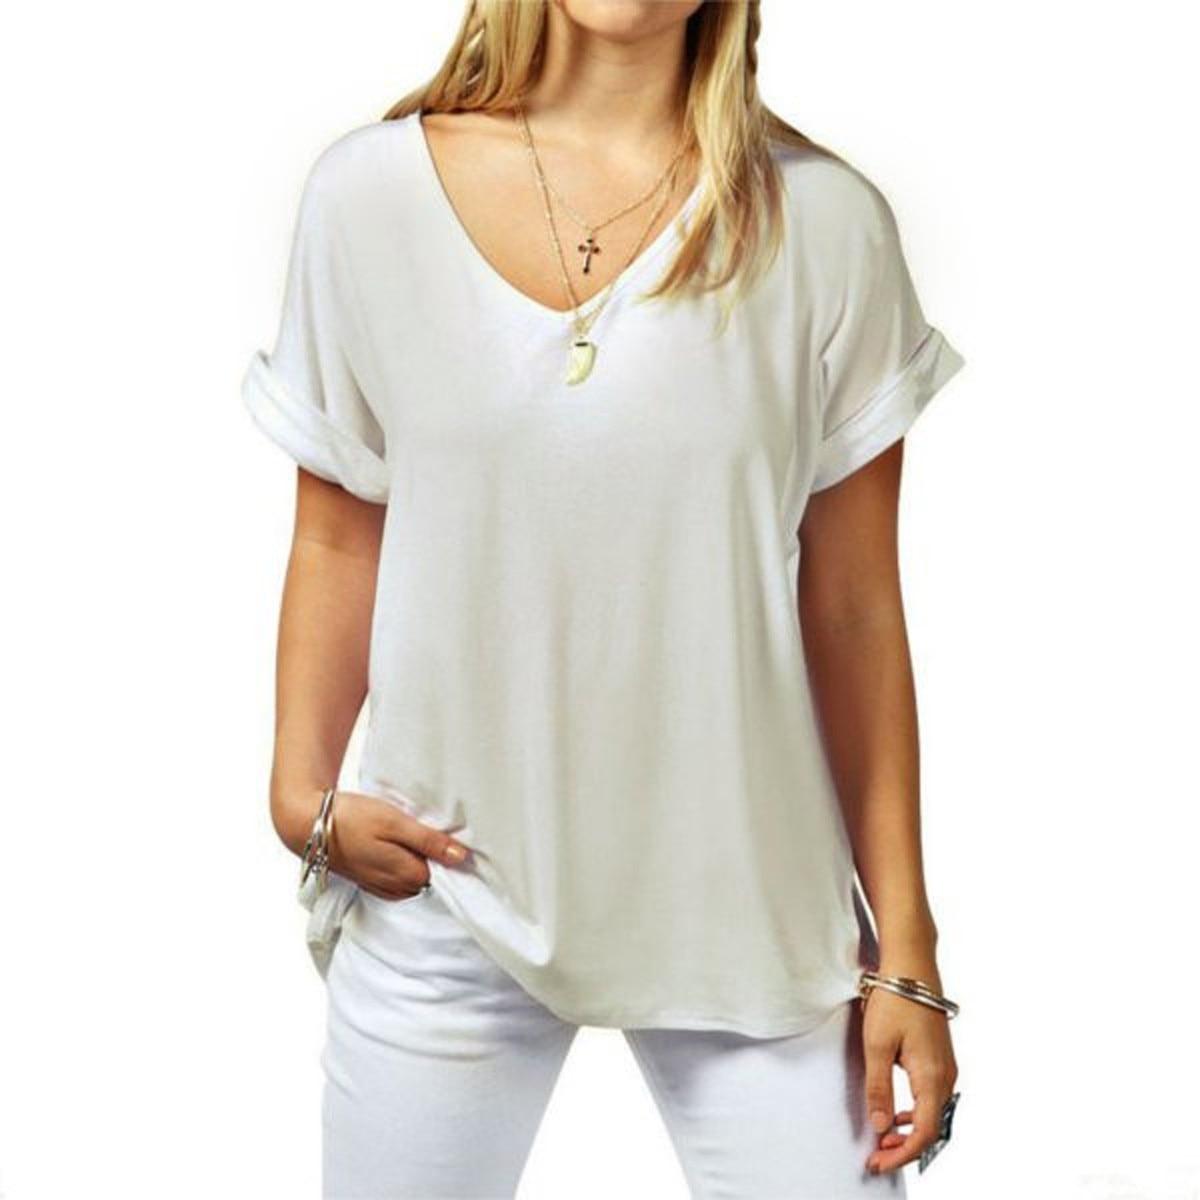 ZANZEA Blusas 2018 Mode Sexig V-hals Kortärmad Damblusar Lös Solid Tops Blus Plus Storlek Blusas Camisas Mujer S-5XL